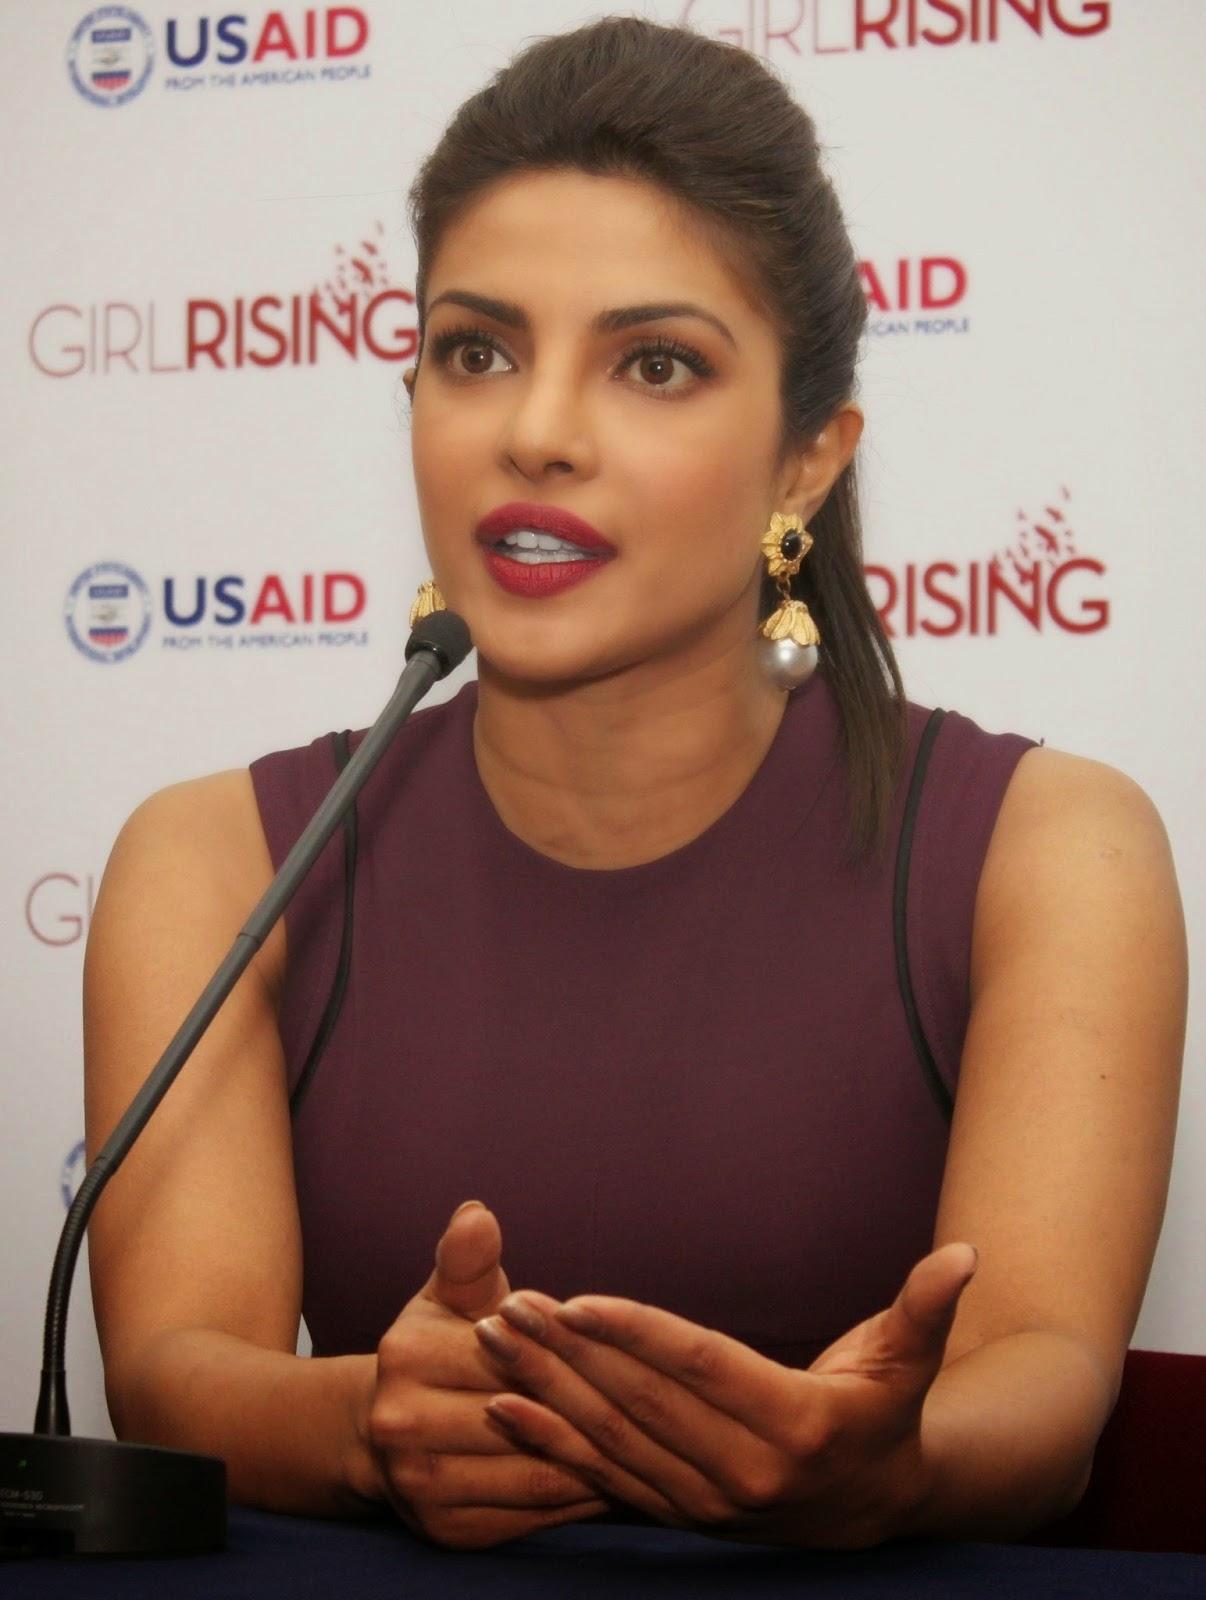 Priyanka Chopra, Freida Pinto At Girl Rising Event -6230